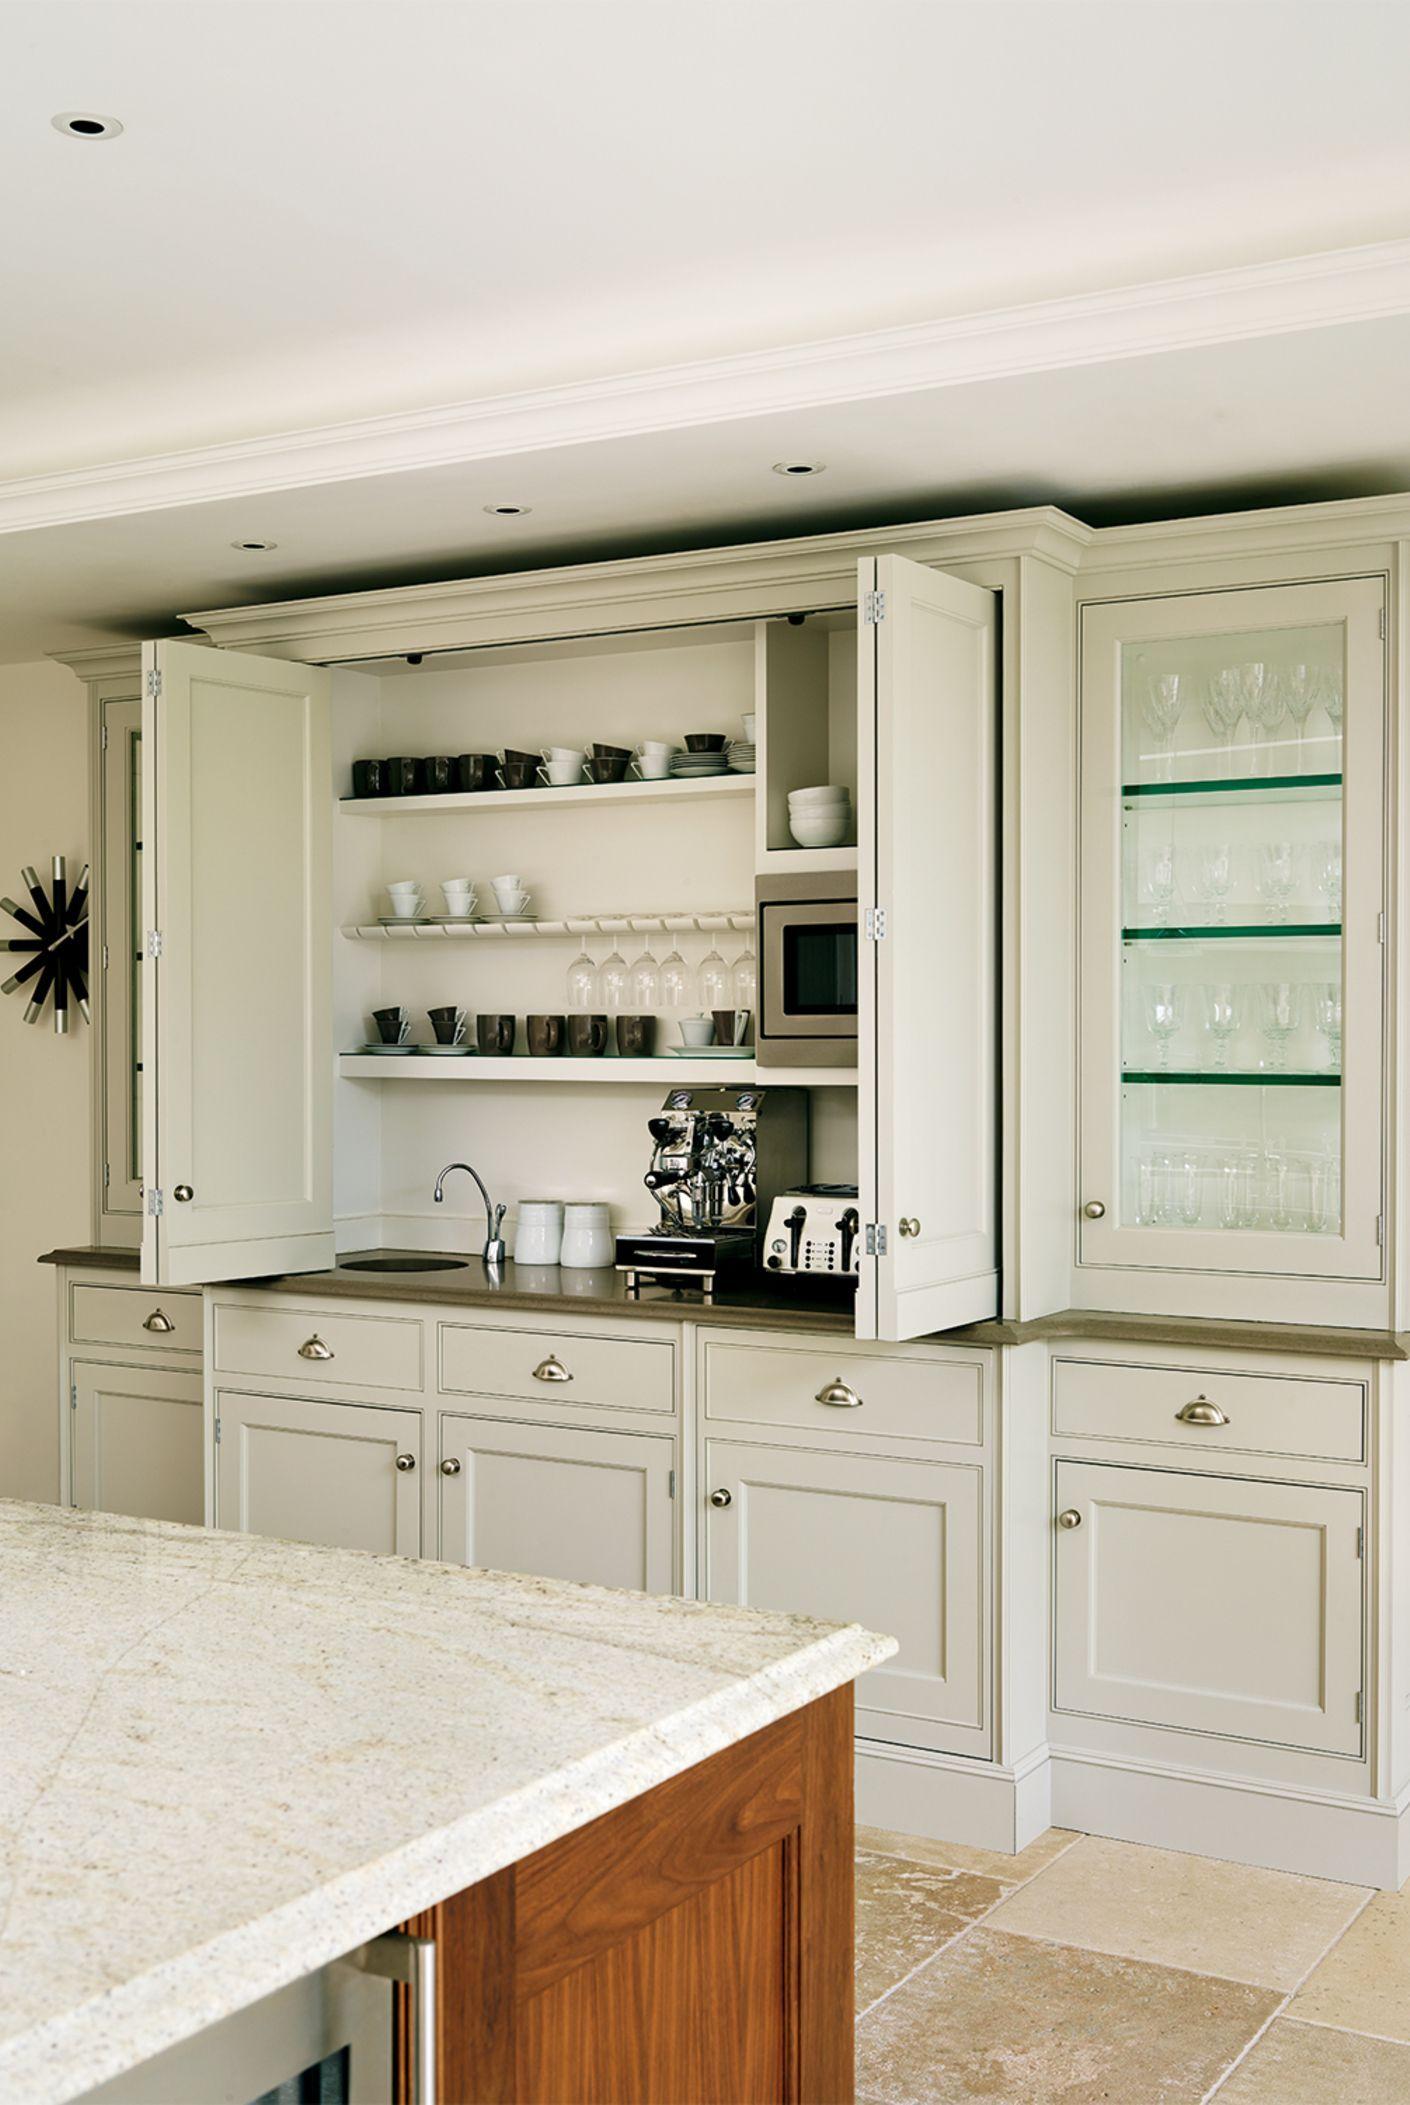 7 smallbone of devizes miller kitchen contemporary classic ...